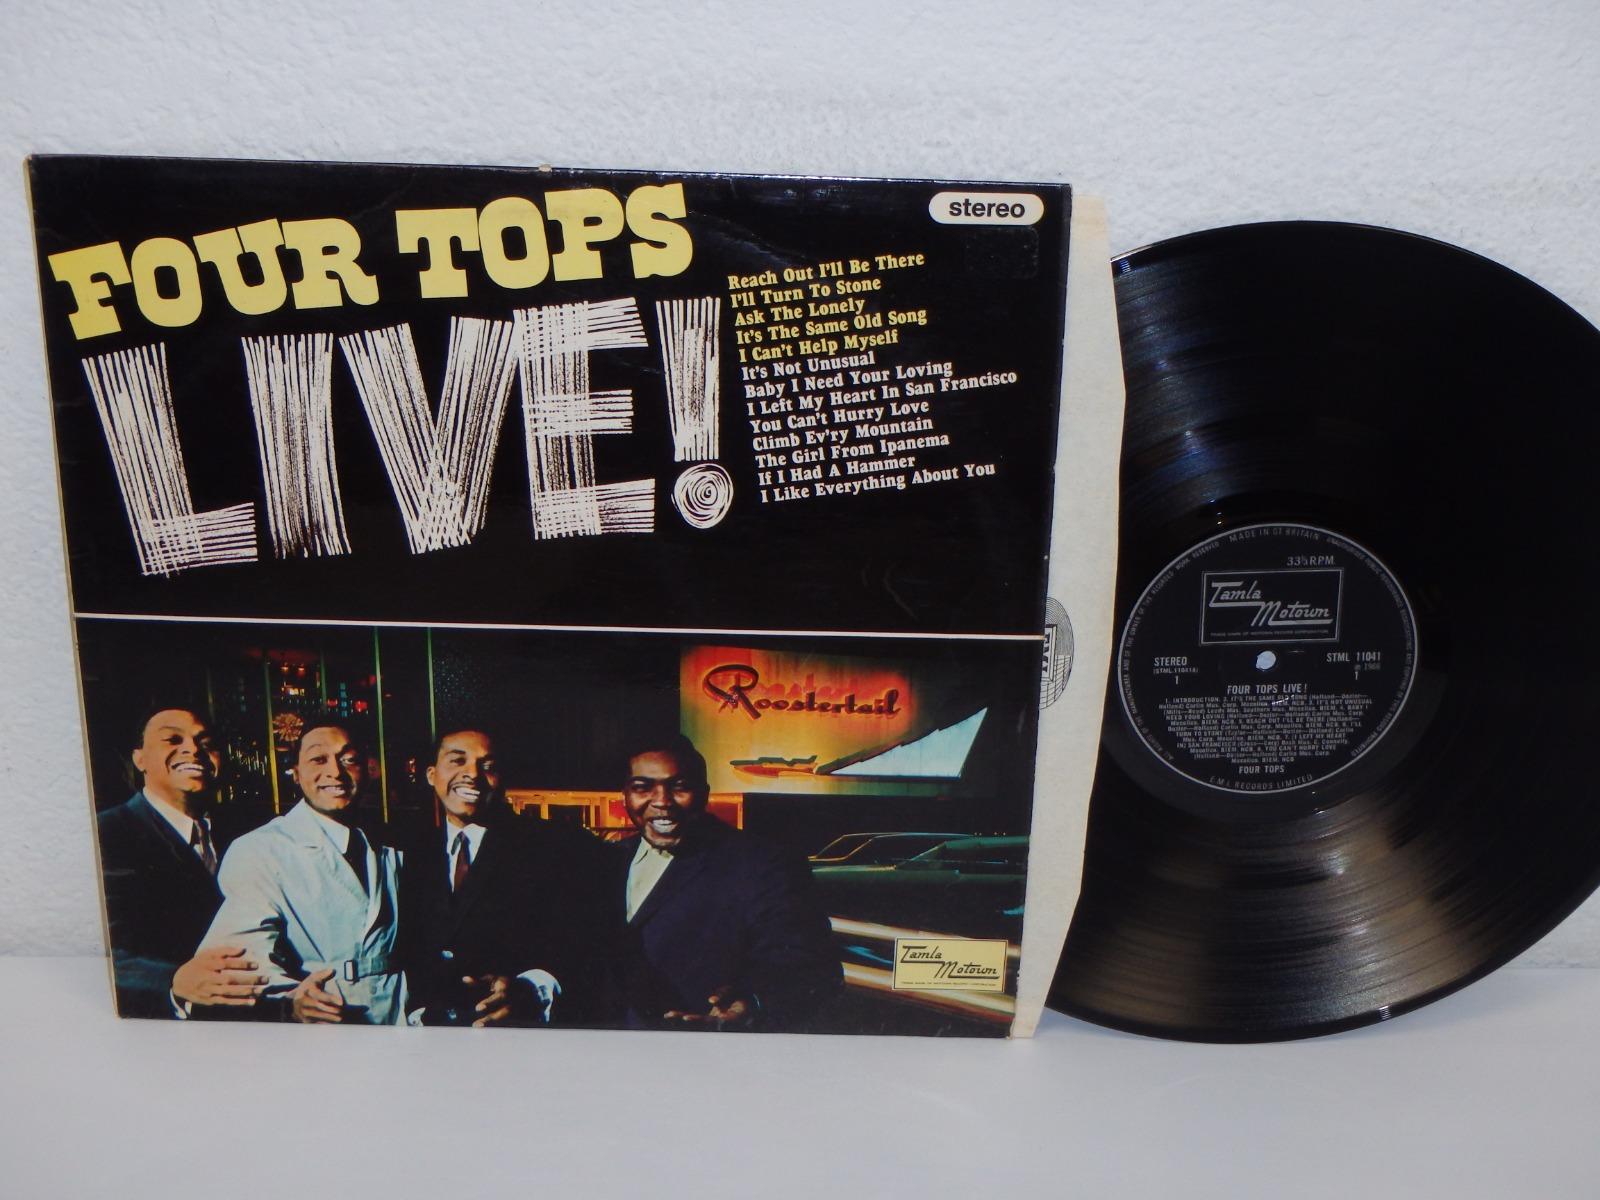 Details about FOUR TOPS Four Tops Live 1967 UK Pressing LP Tamla Motown  STML11041 SOUL